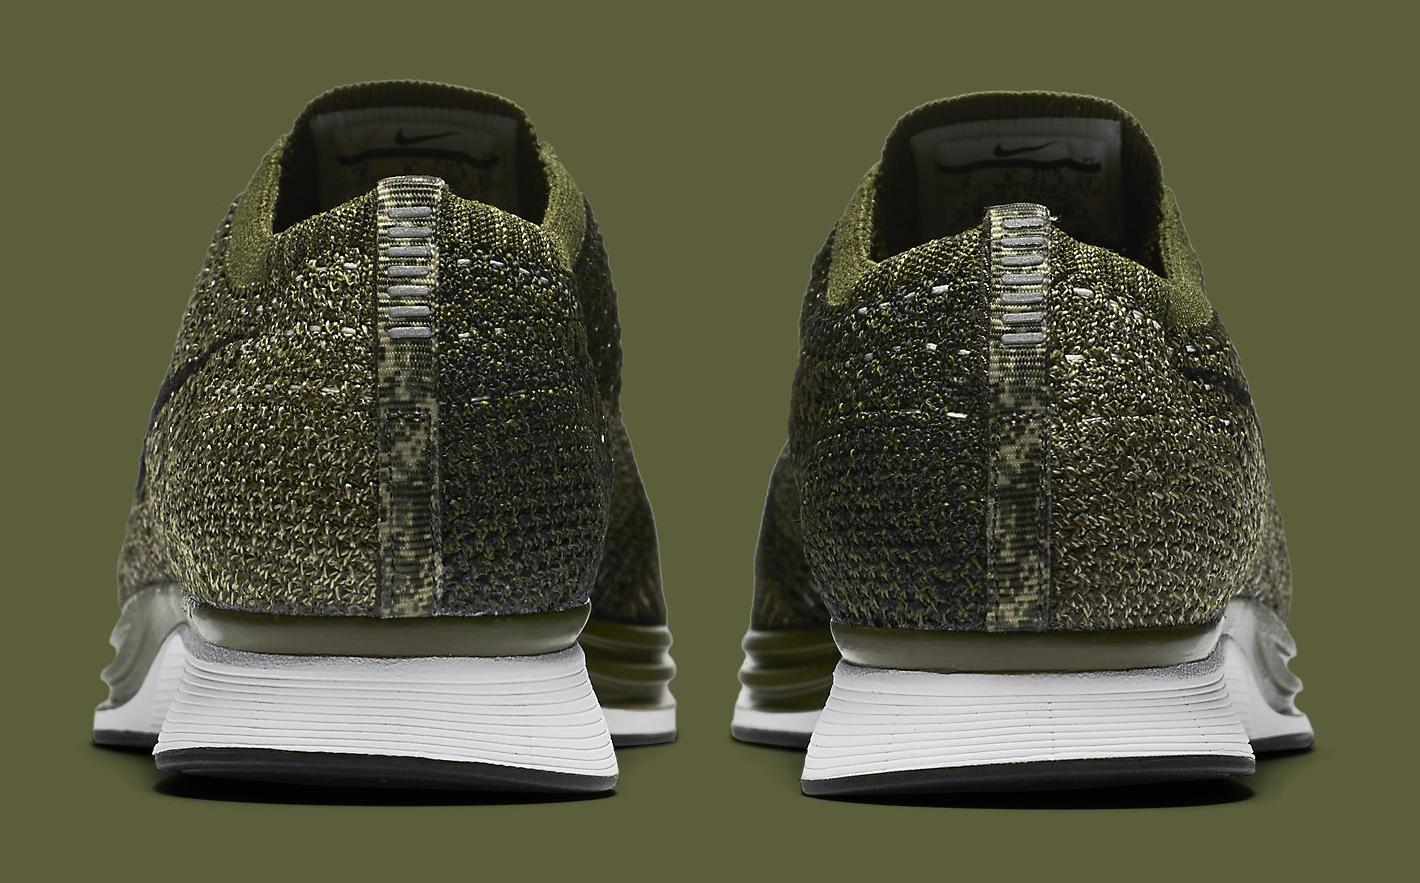 Nike Flyknit Racer Green Camo 862713-300 Heel